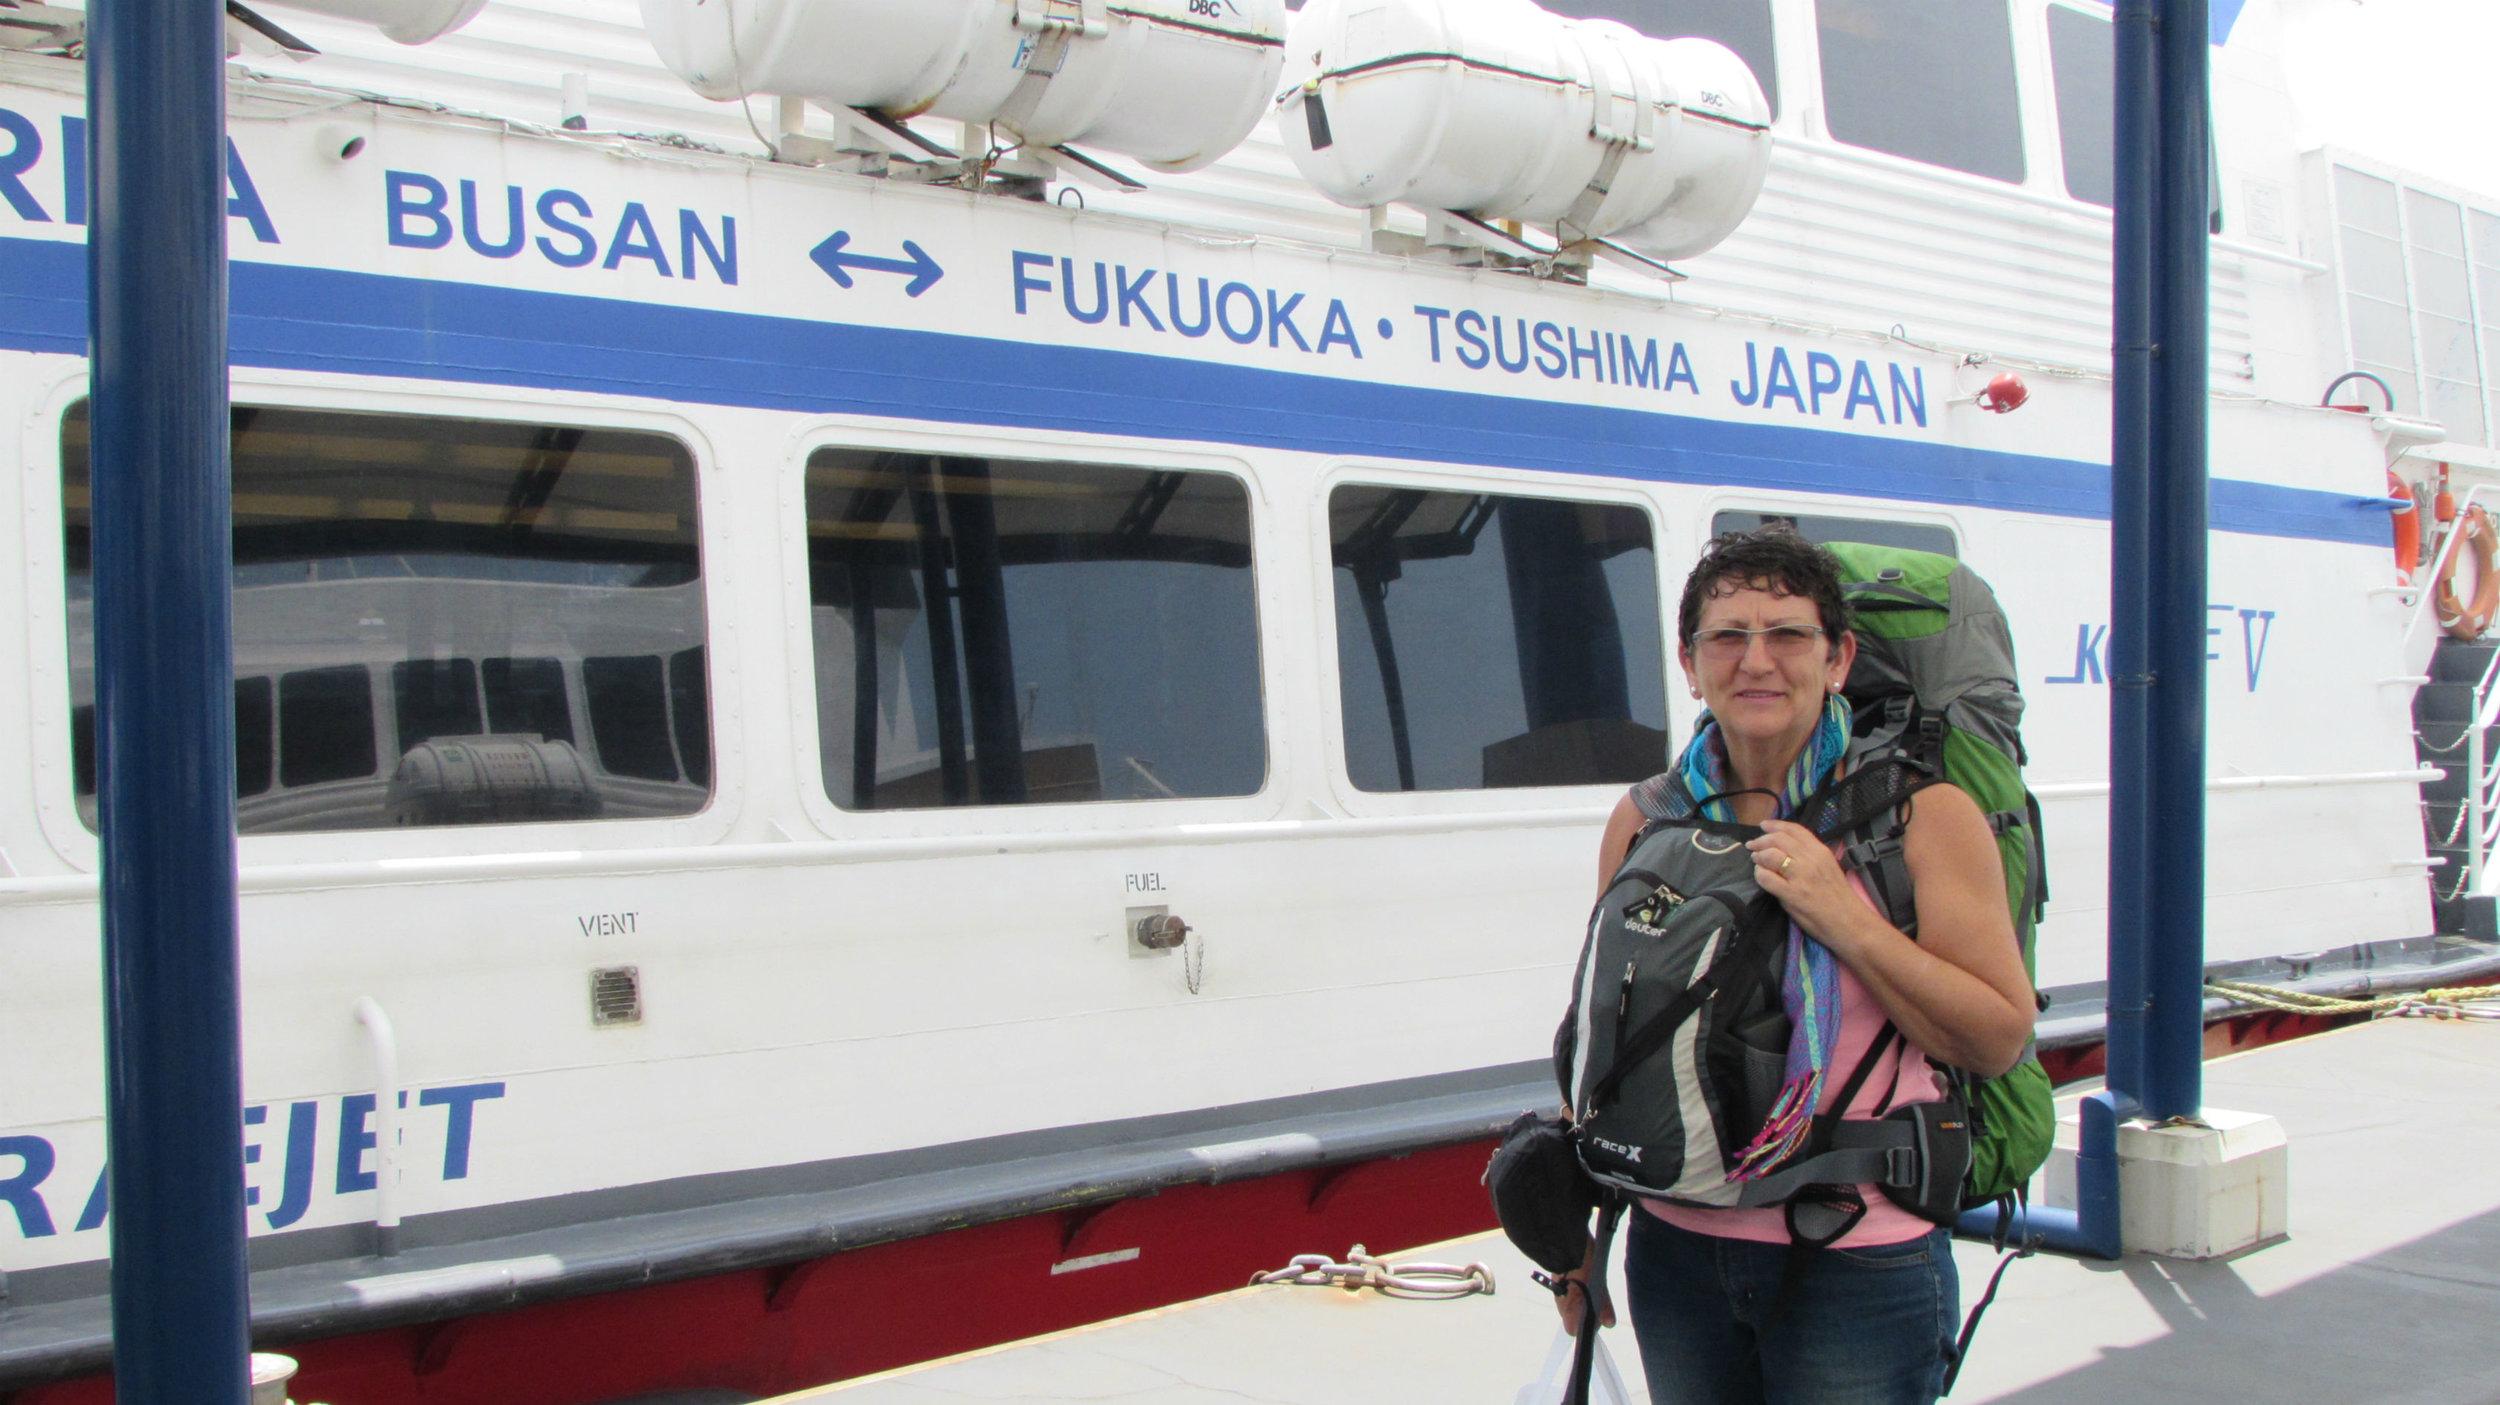 Arriving in Fukuoka, Japan